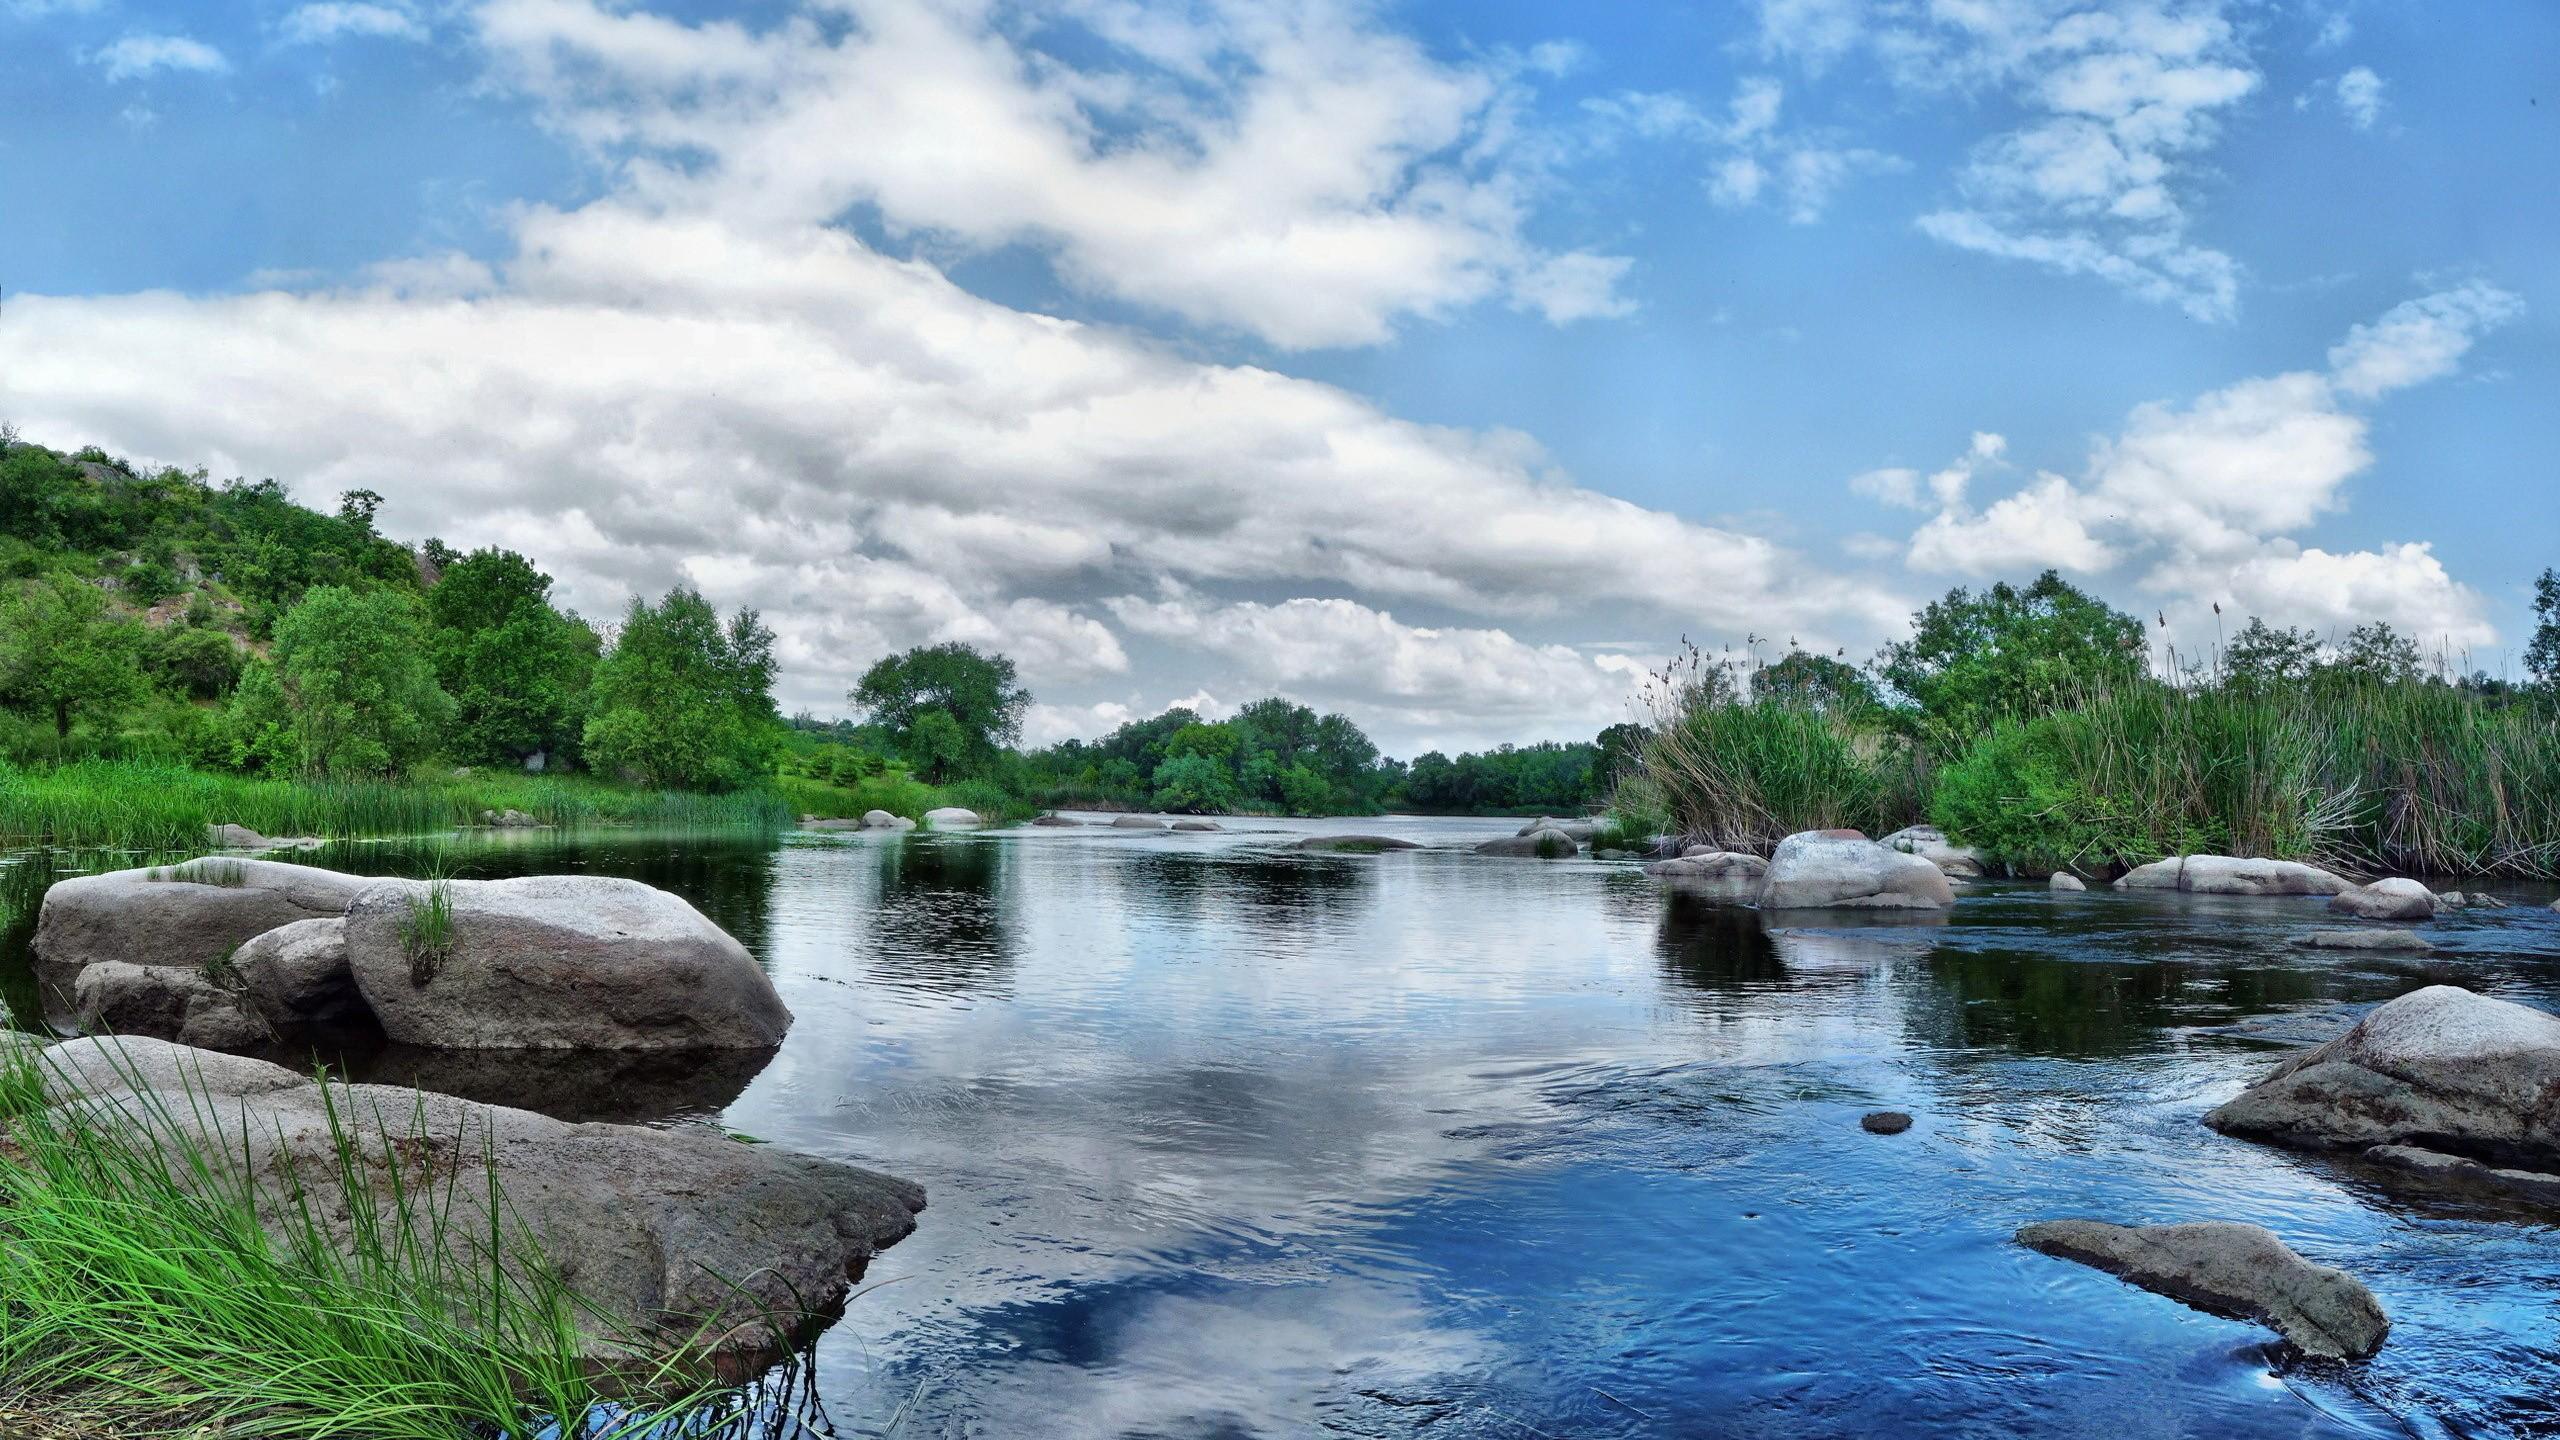 download rocky river wallpaper - photo #17